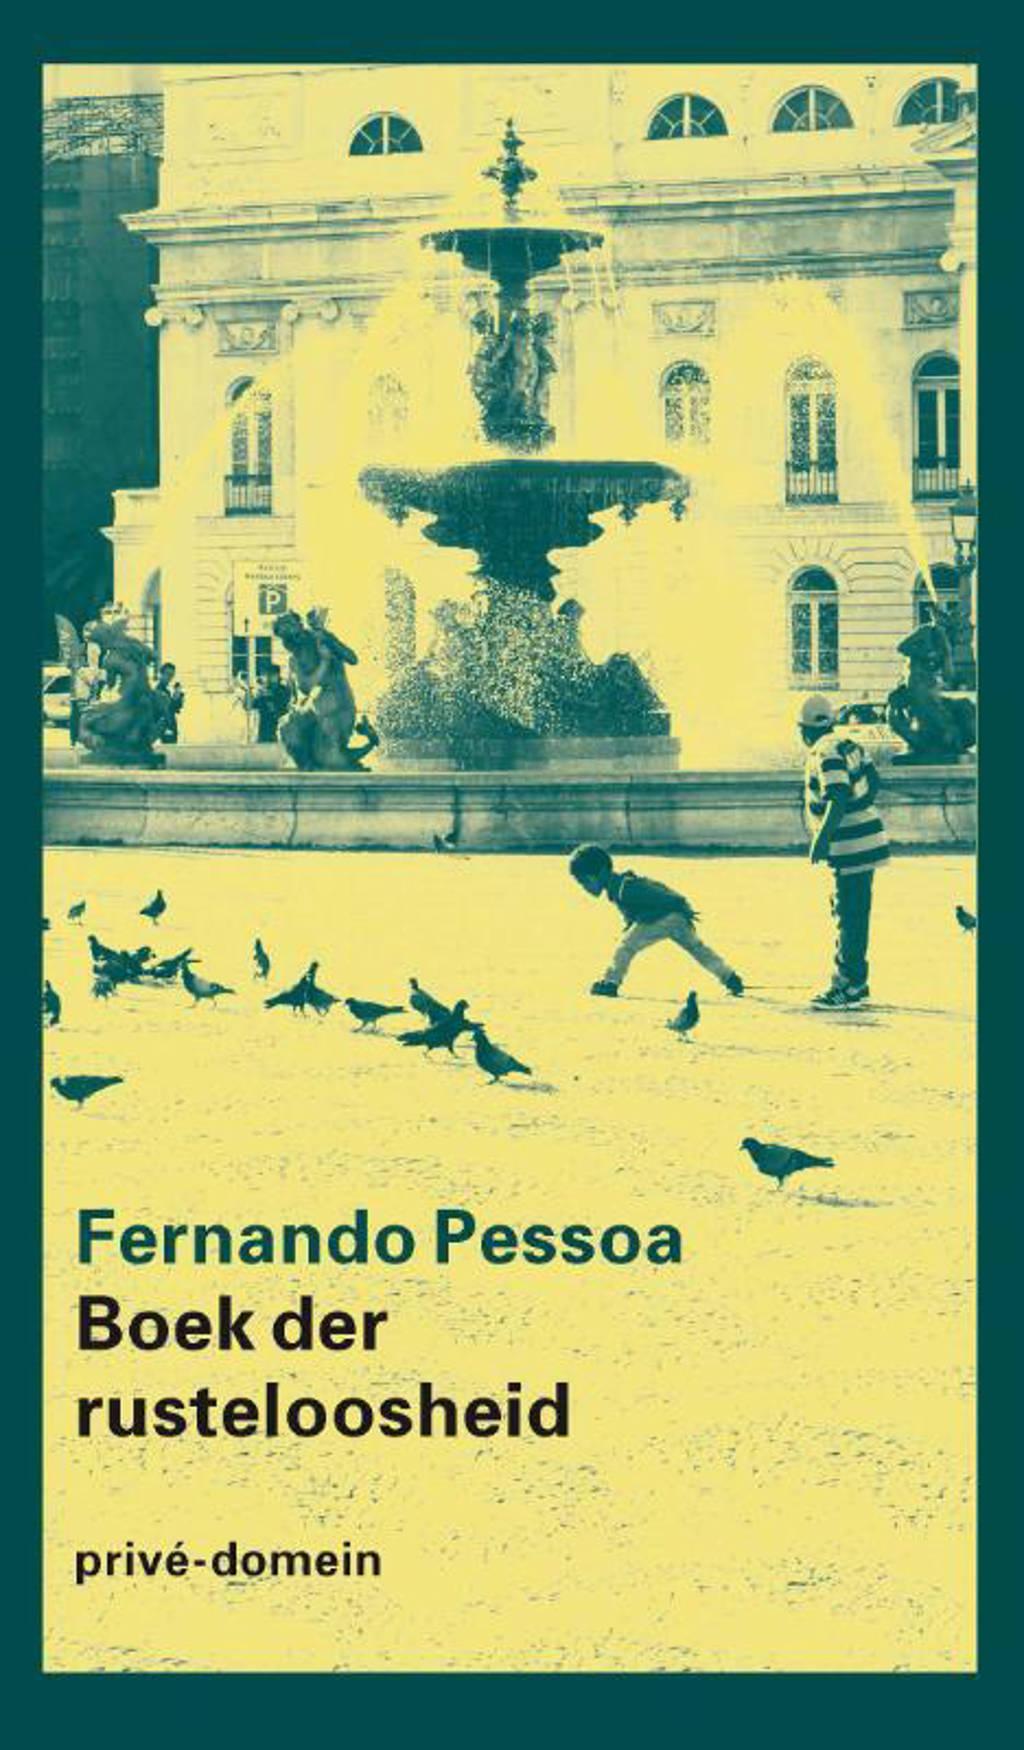 Boek der rusteloosheid - Fernando Pessoa